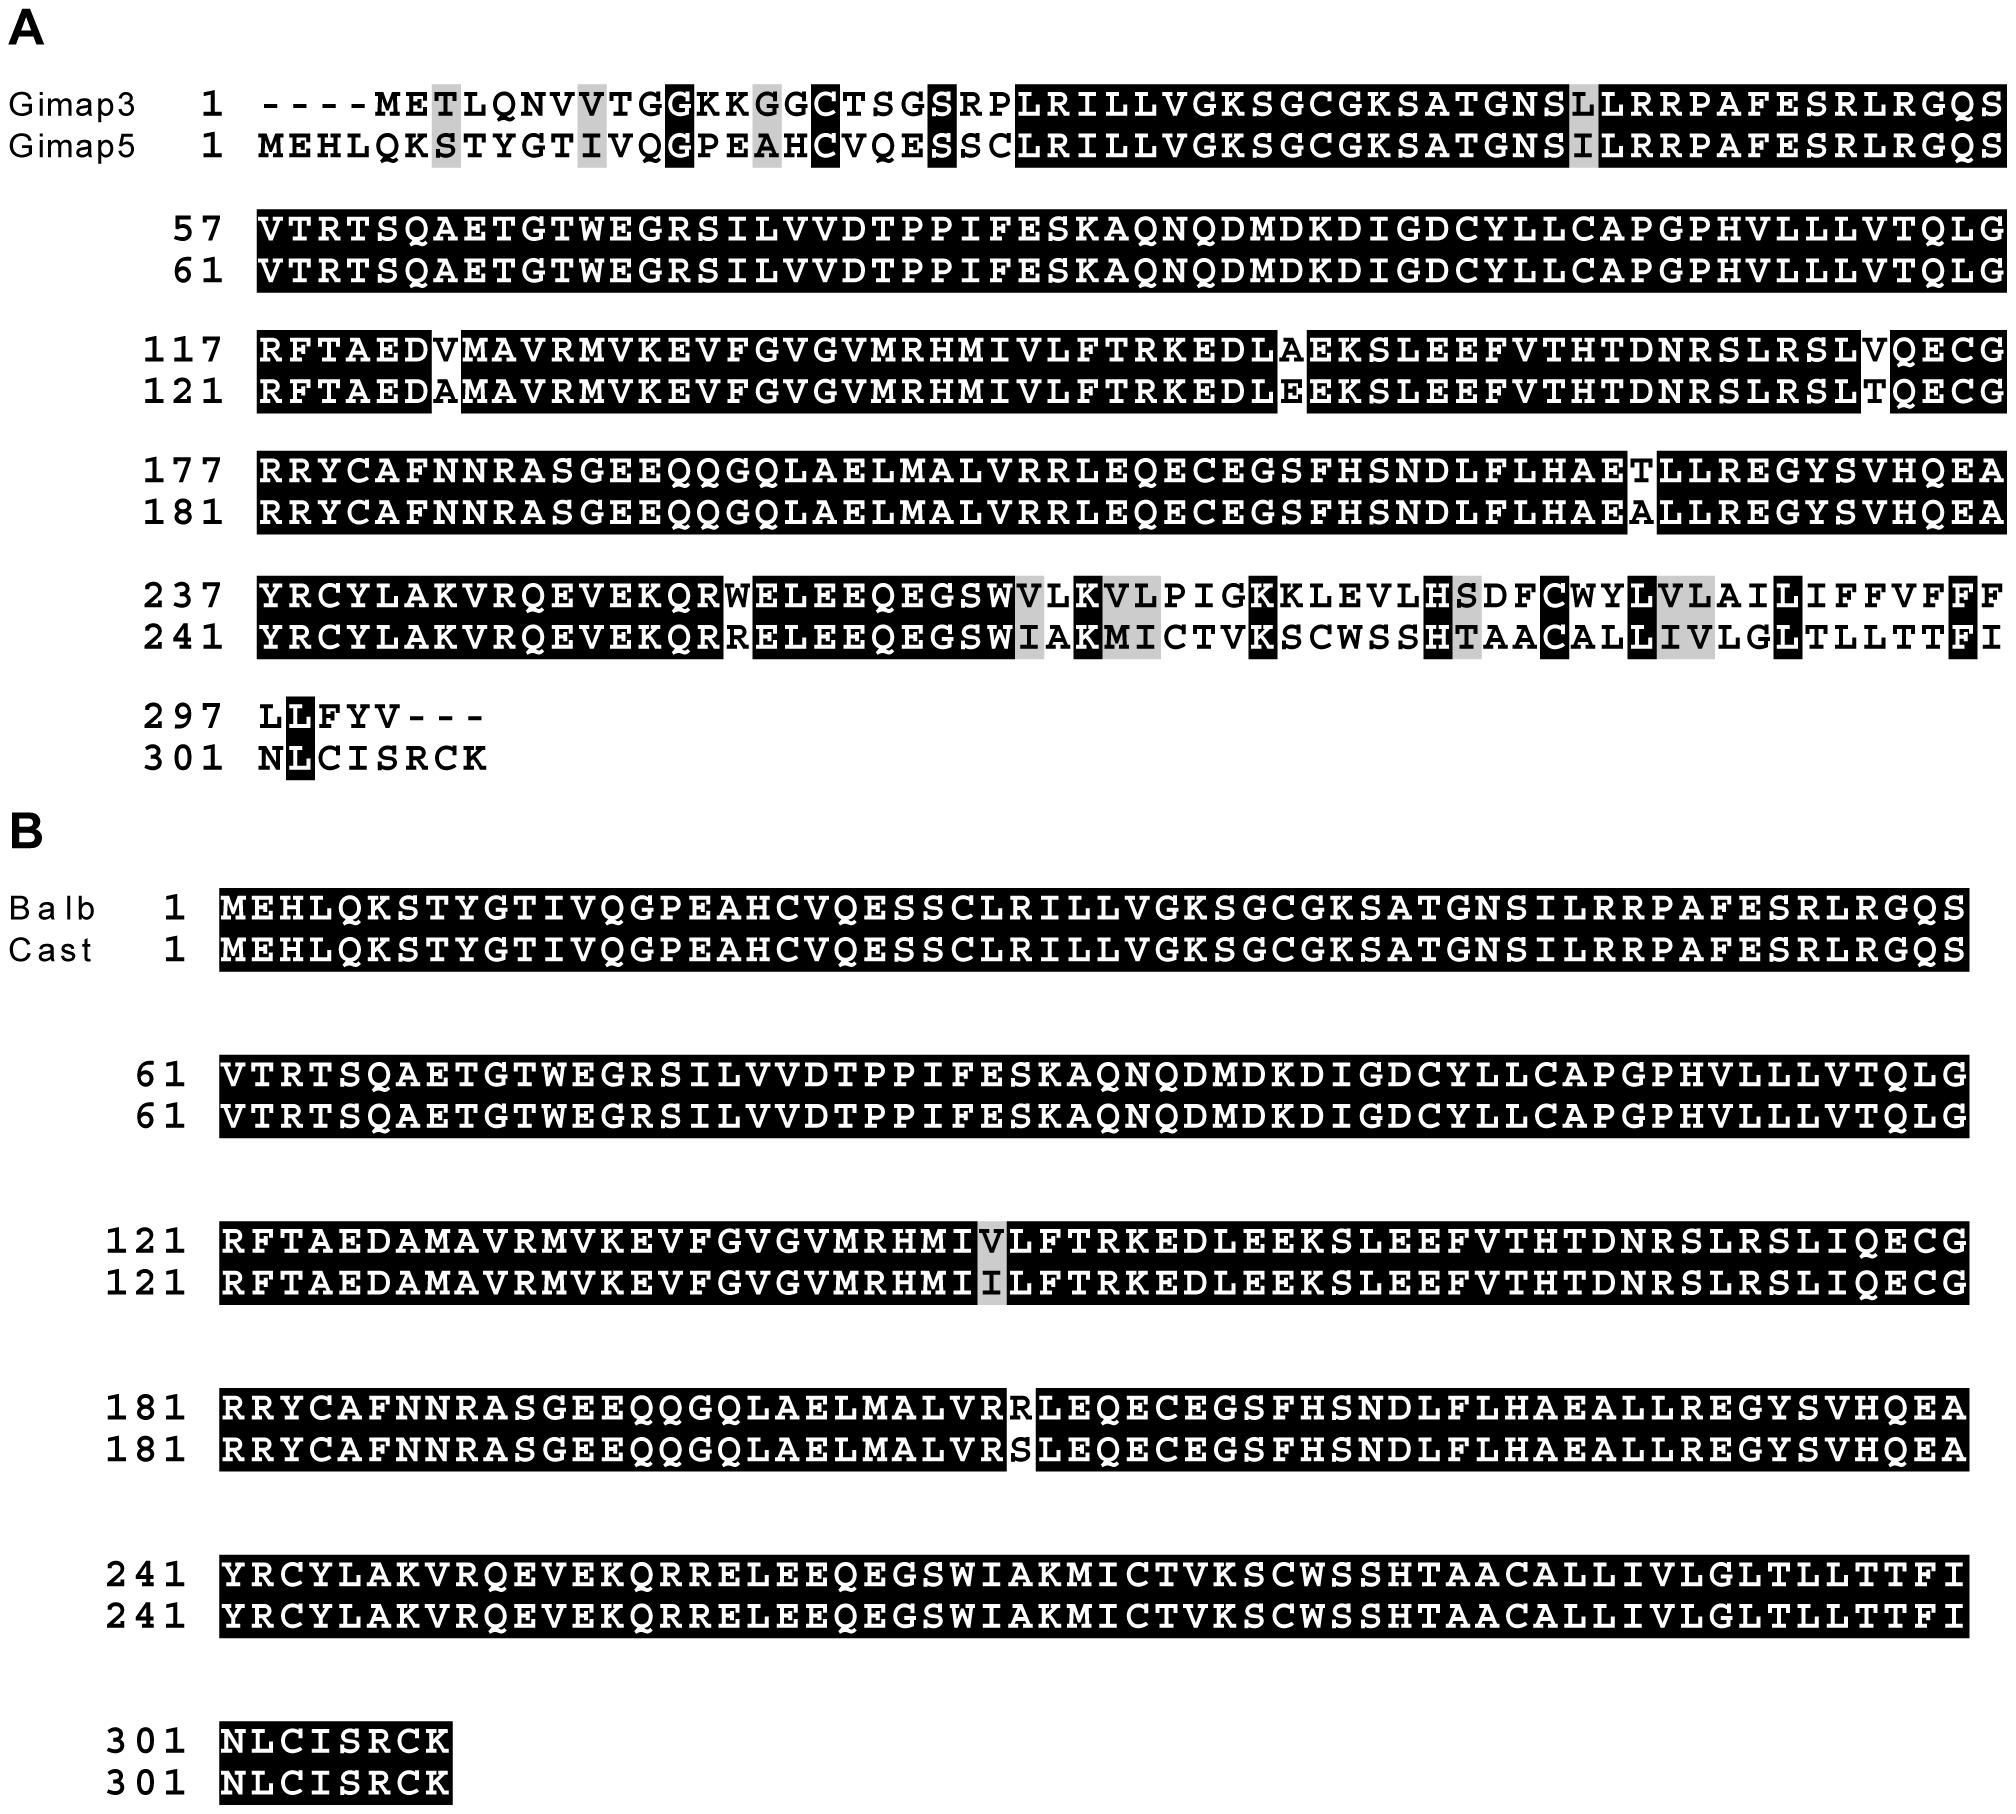 Gimap3 and Gimap5 protein sequences.